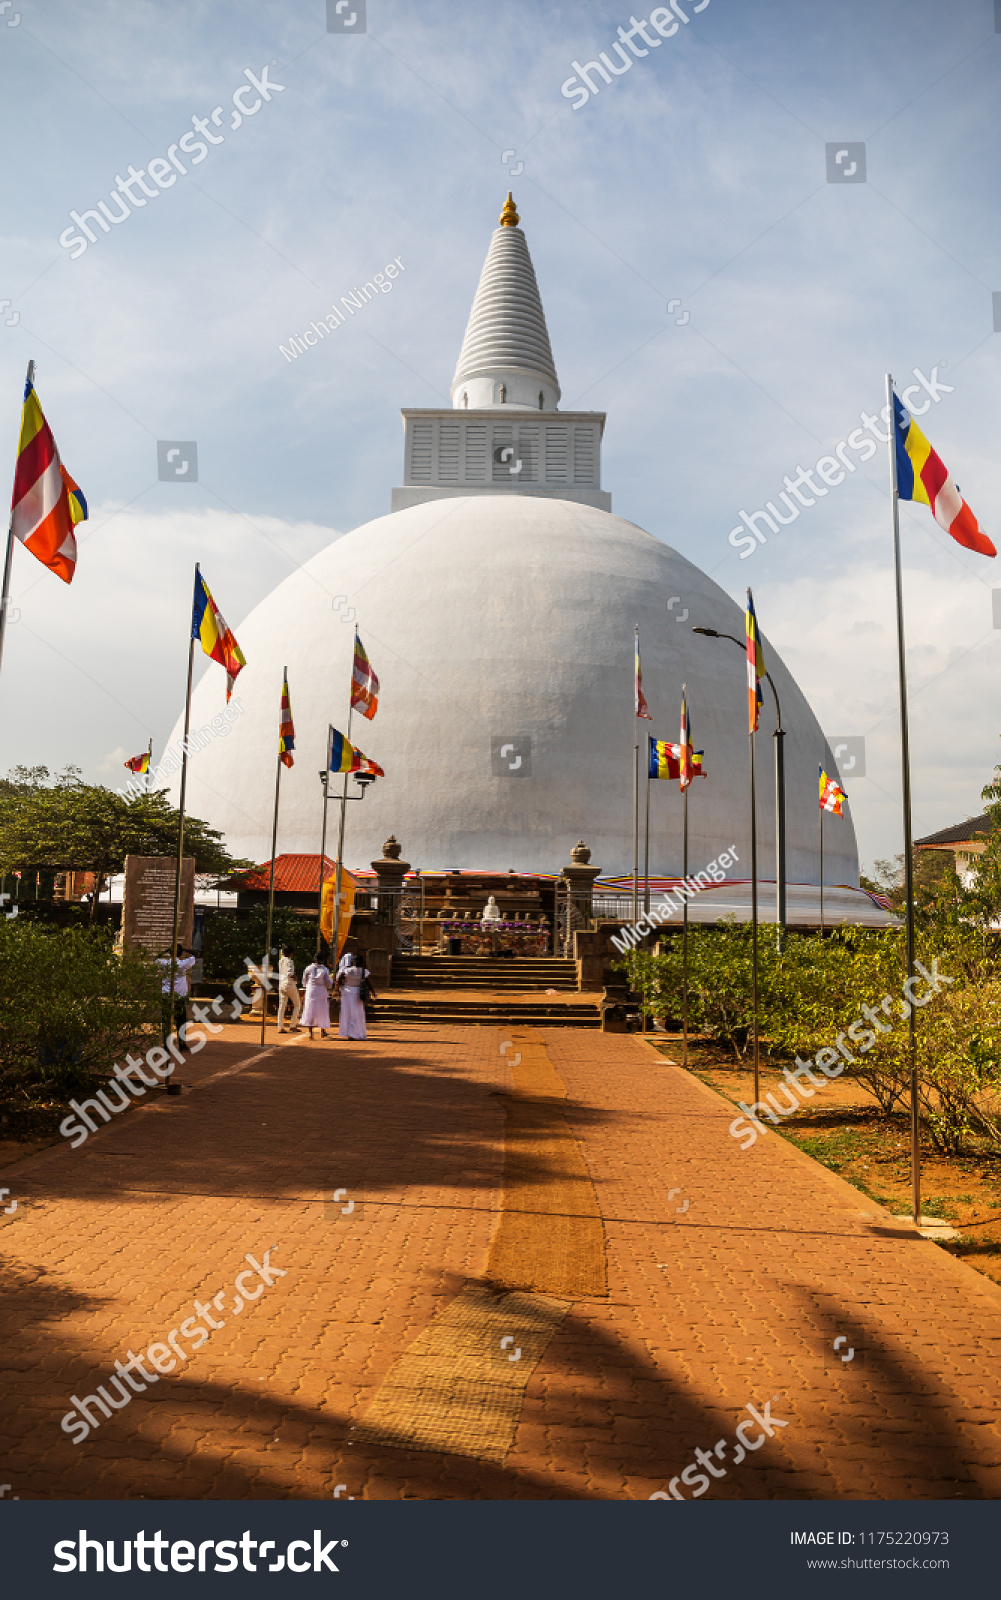 Sri Lanka Anuradhapura, acient city, Mahiyangana Stupa is the first stupa of ancient Sri Lanka